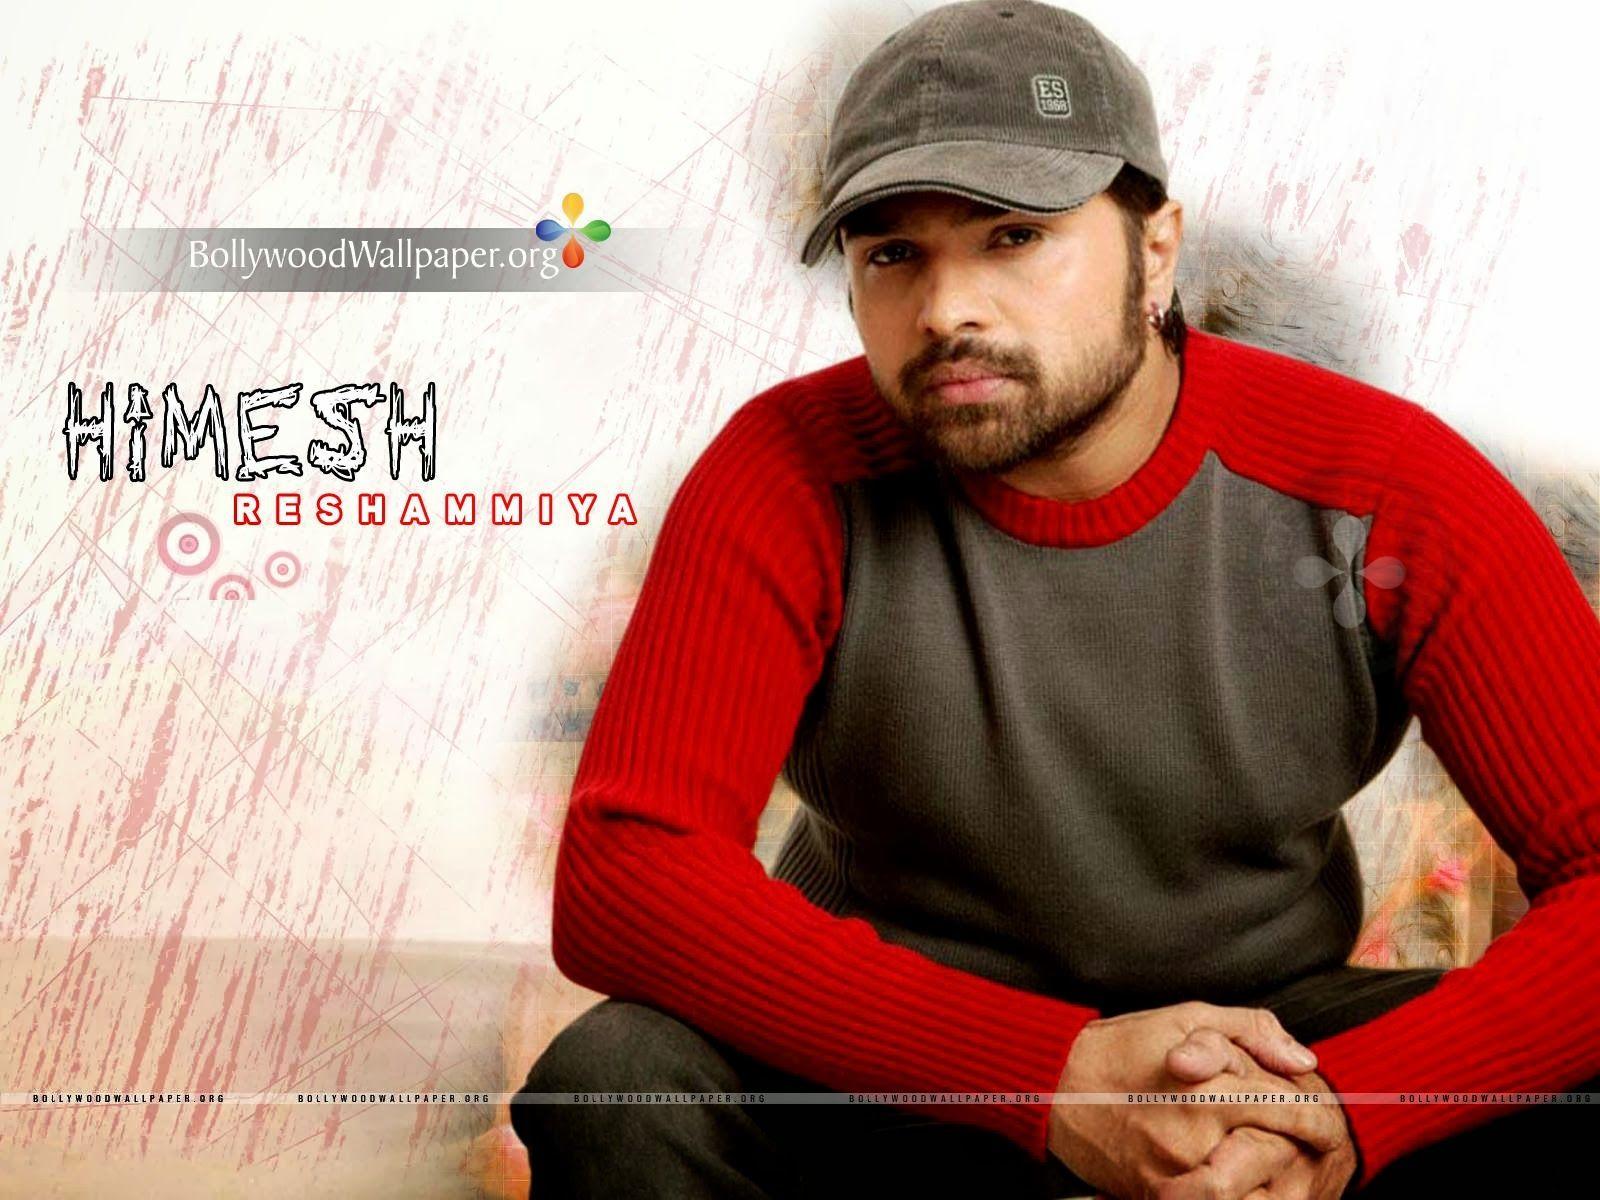 Himesh Reshammiya All Mp3 Songs Free Download Online Movies Mp3 Song Songs Mens Tshirts